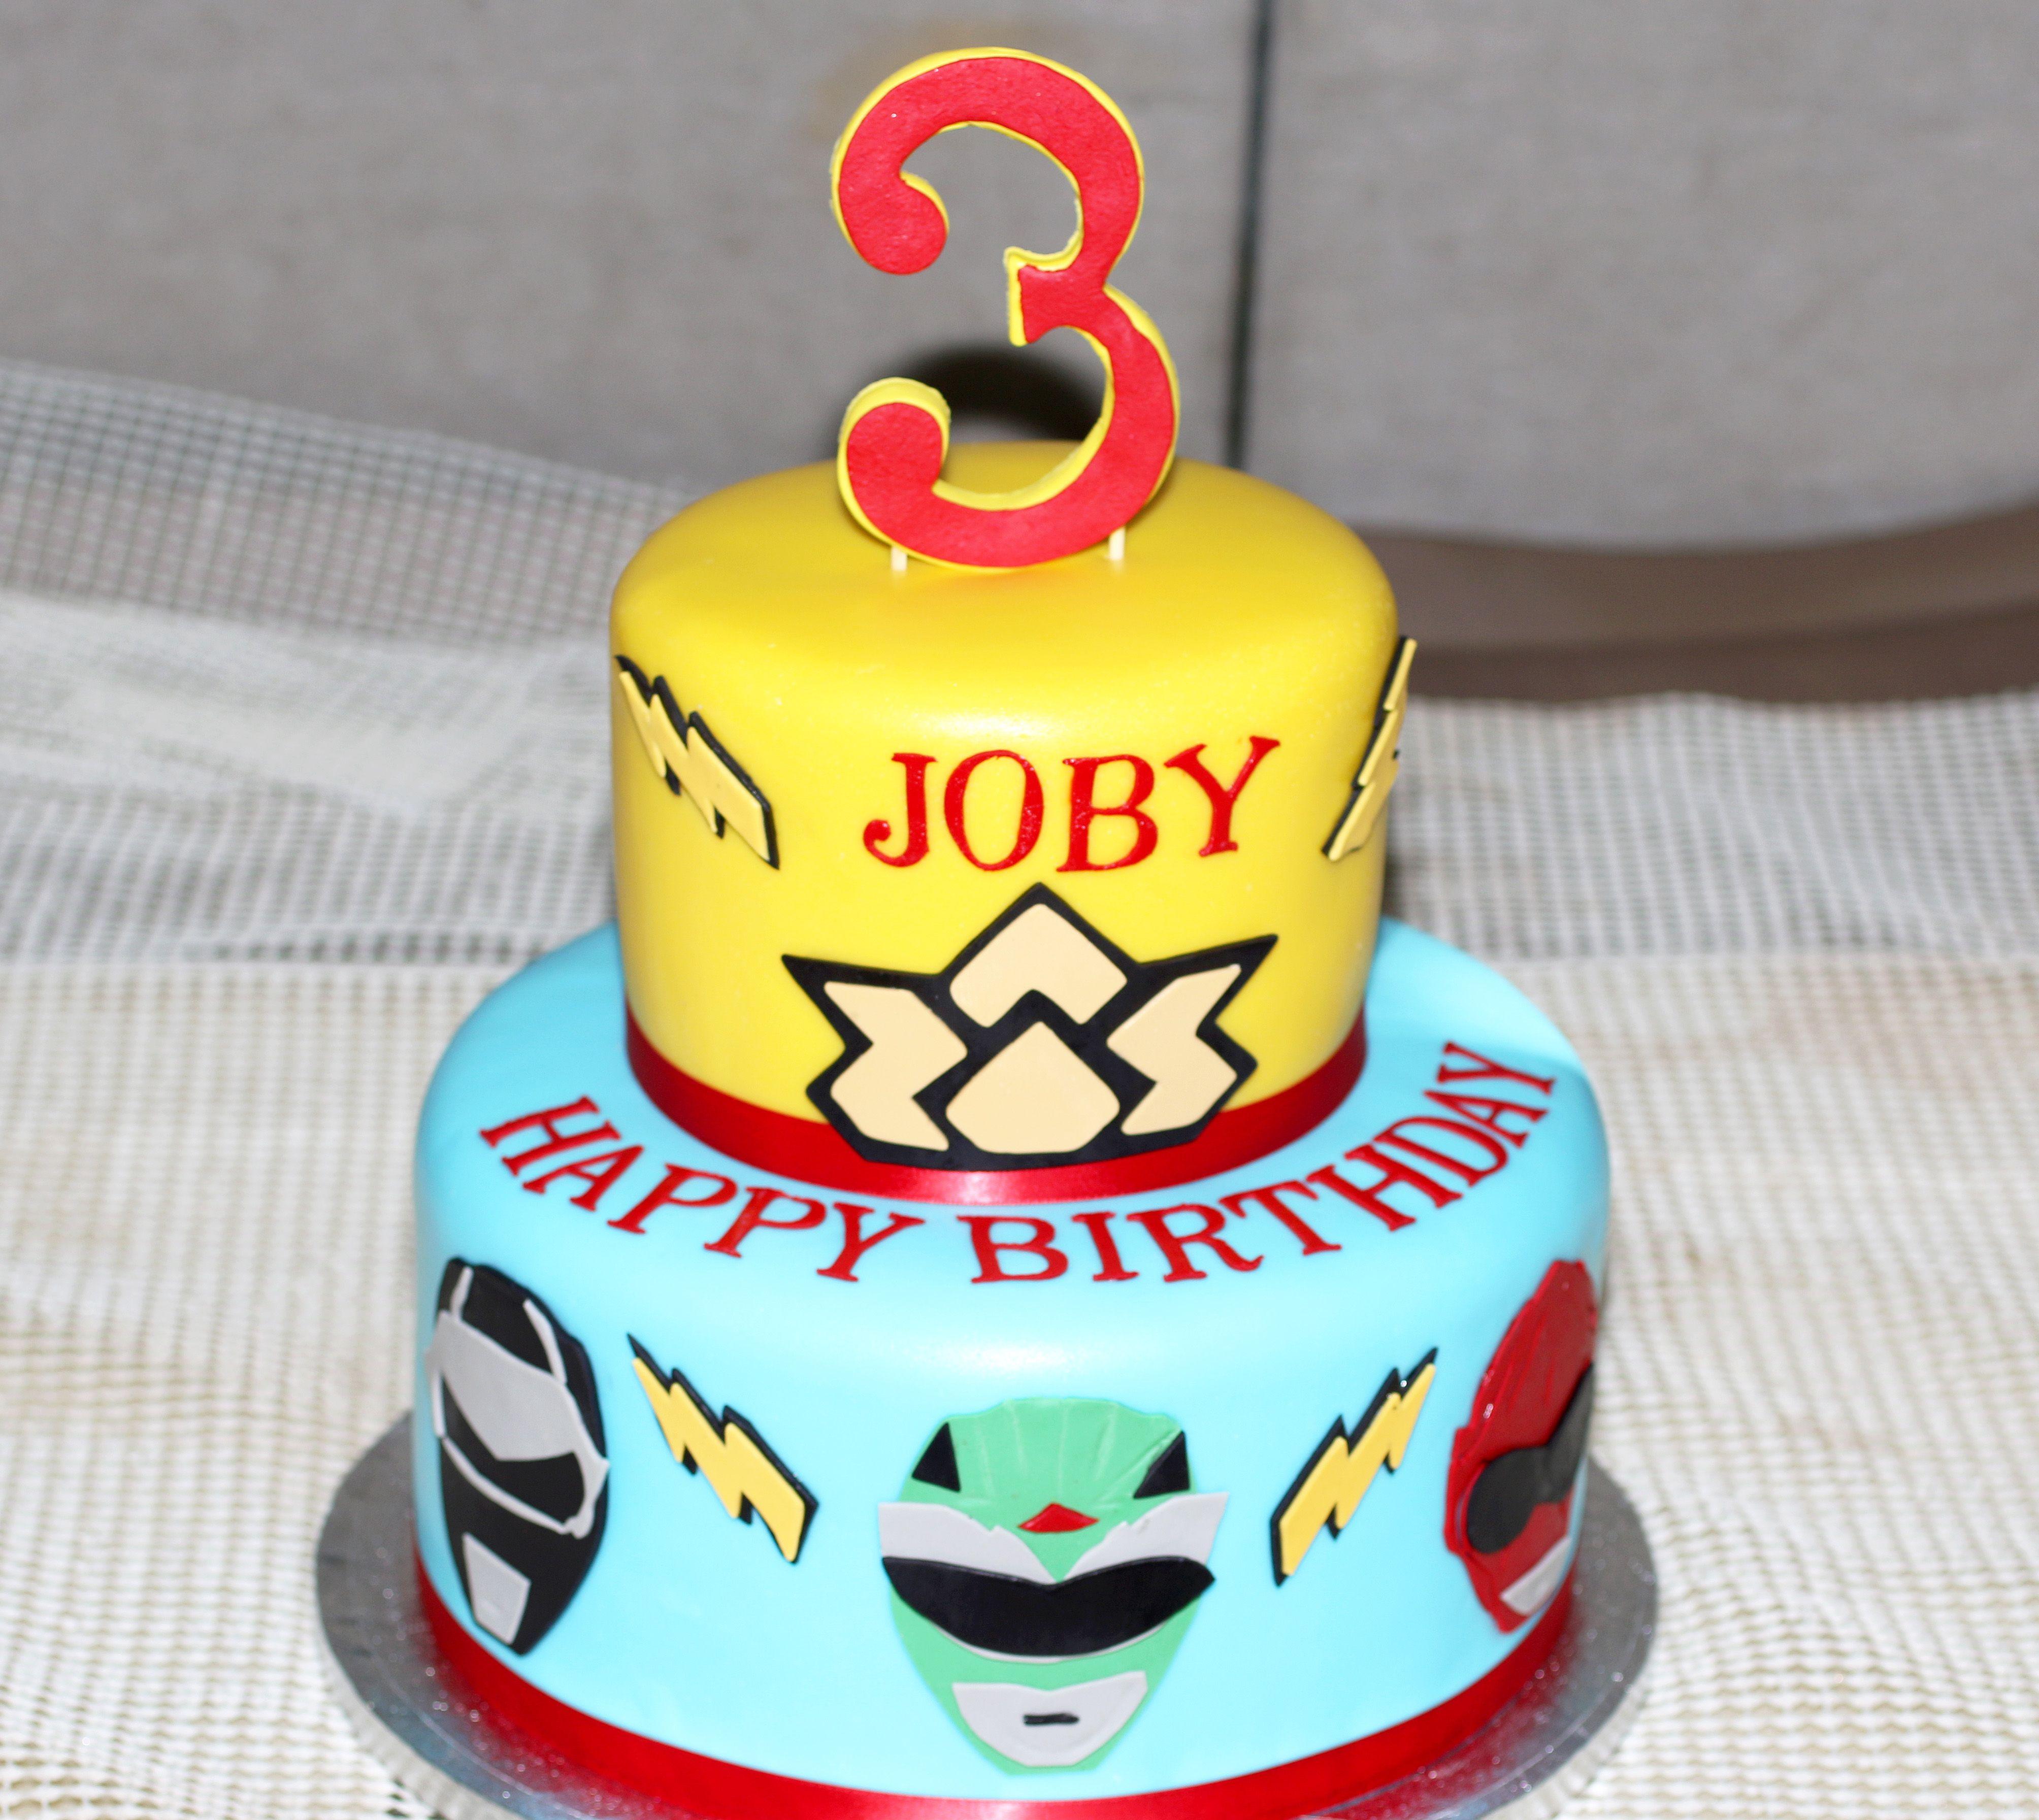 Astonishing Carries Cakes Real Cake Cake Ideas Wedding Cake Power Rangers Funny Birthday Cards Online Inifofree Goldxyz